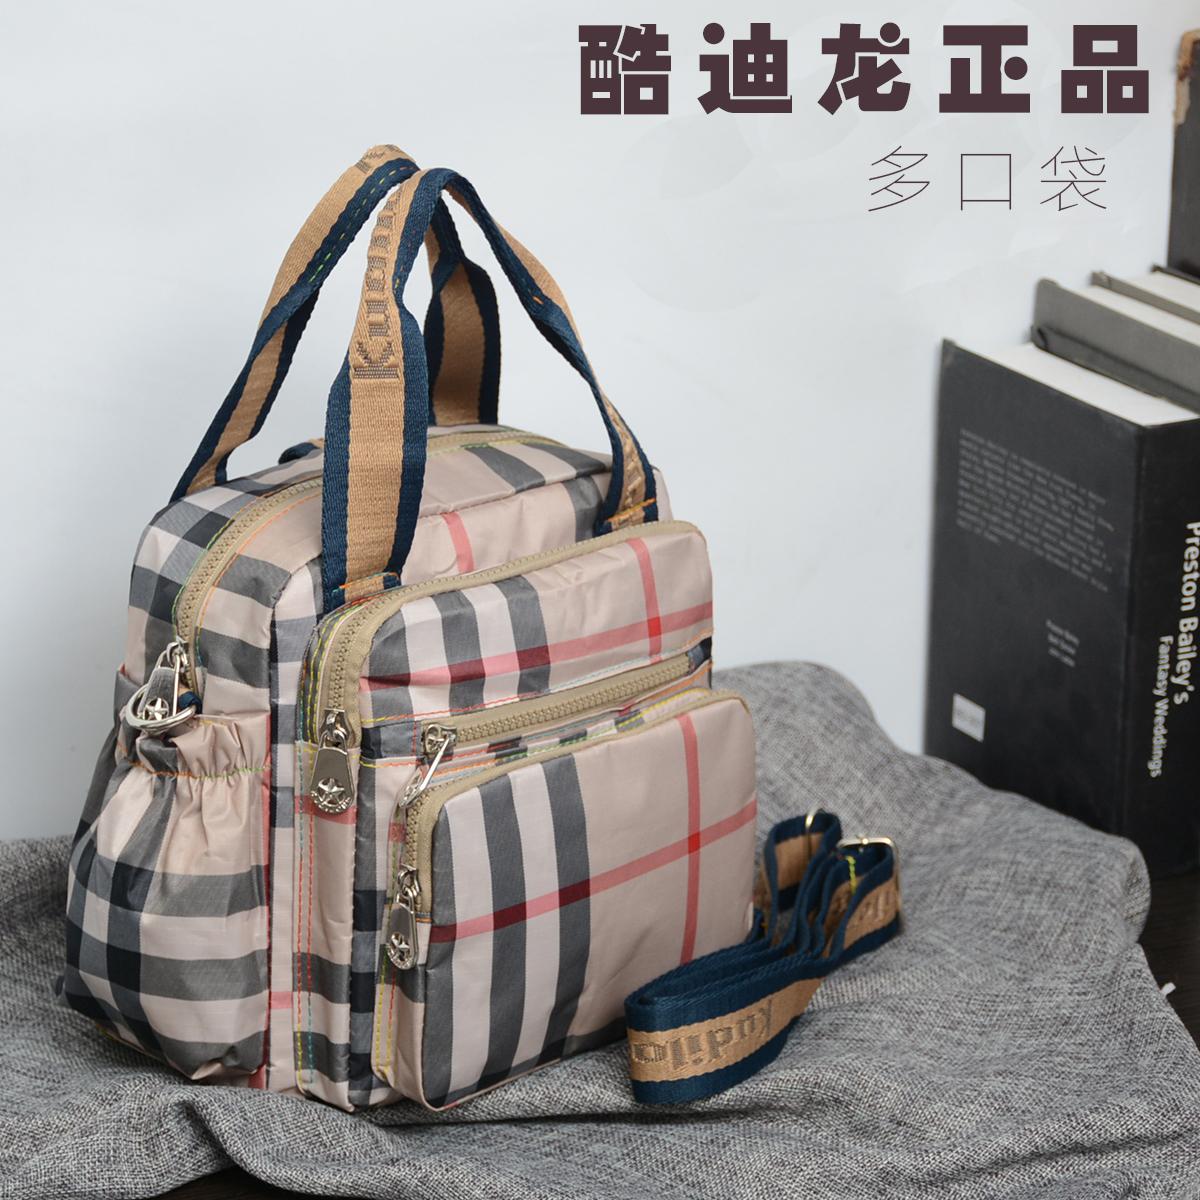 Женские сумки / Кошельки / Рюкзаки Артикул 541587831589